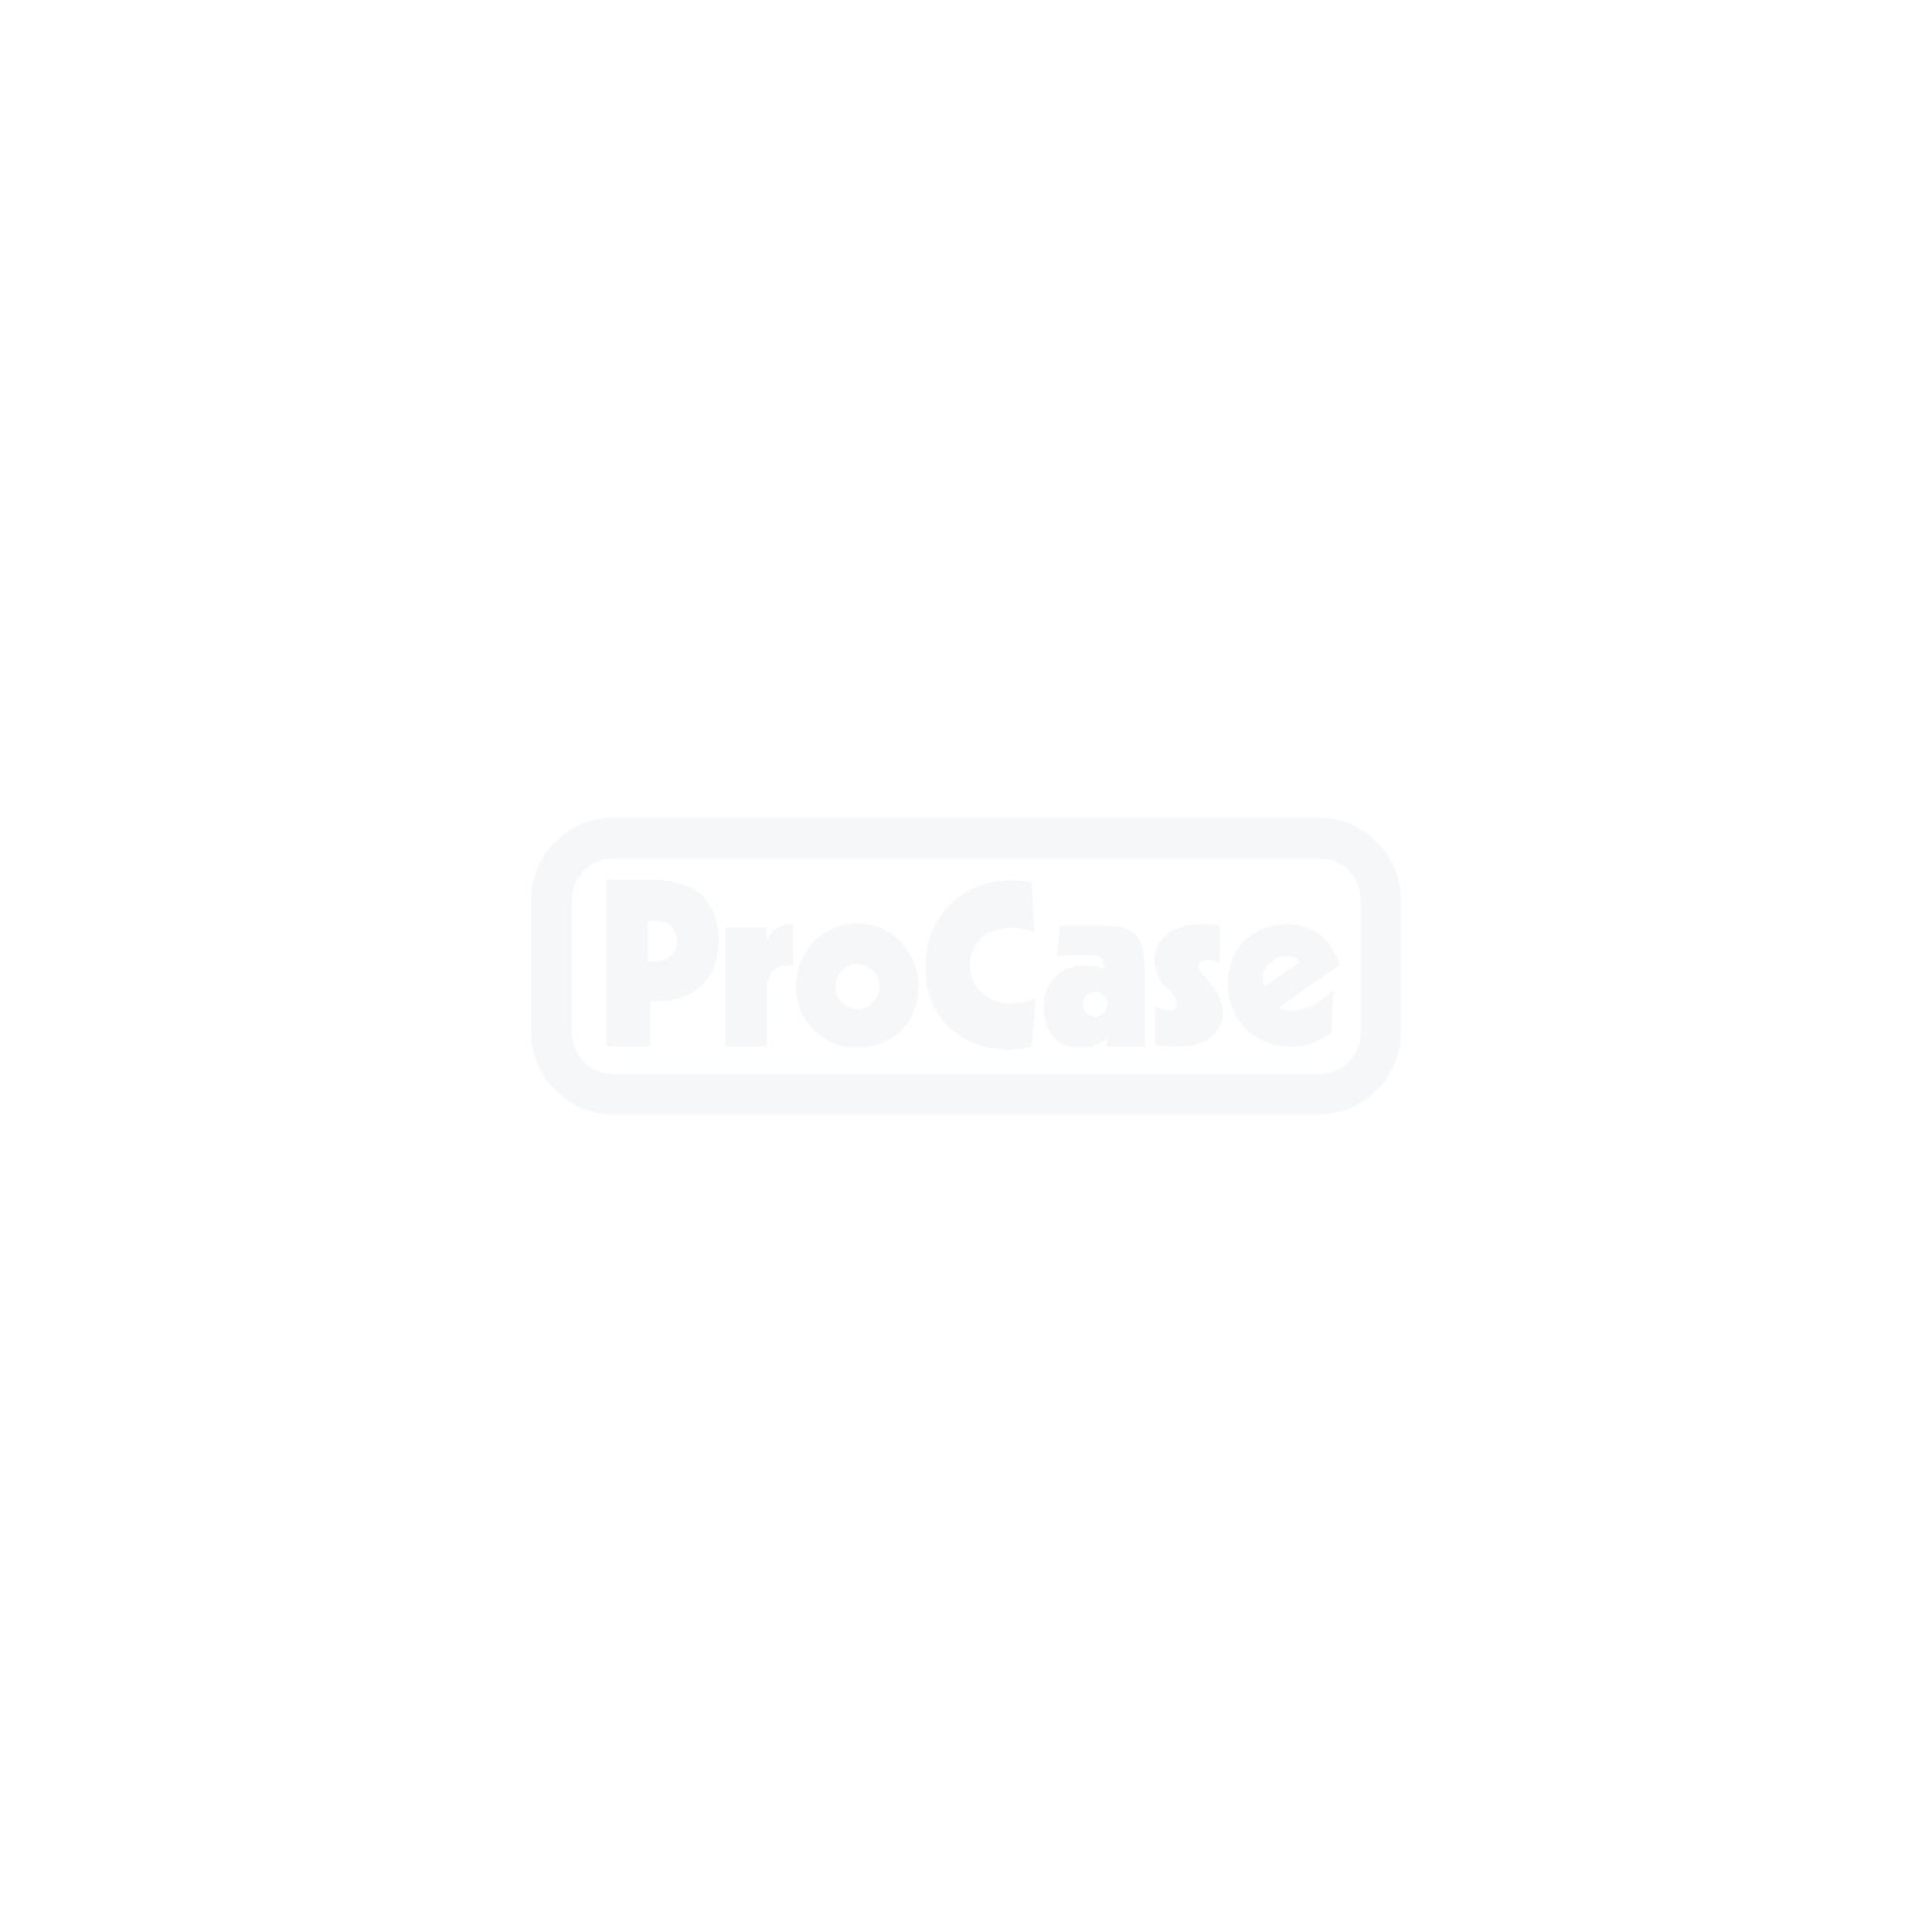 Digitales Min Max Thermometer